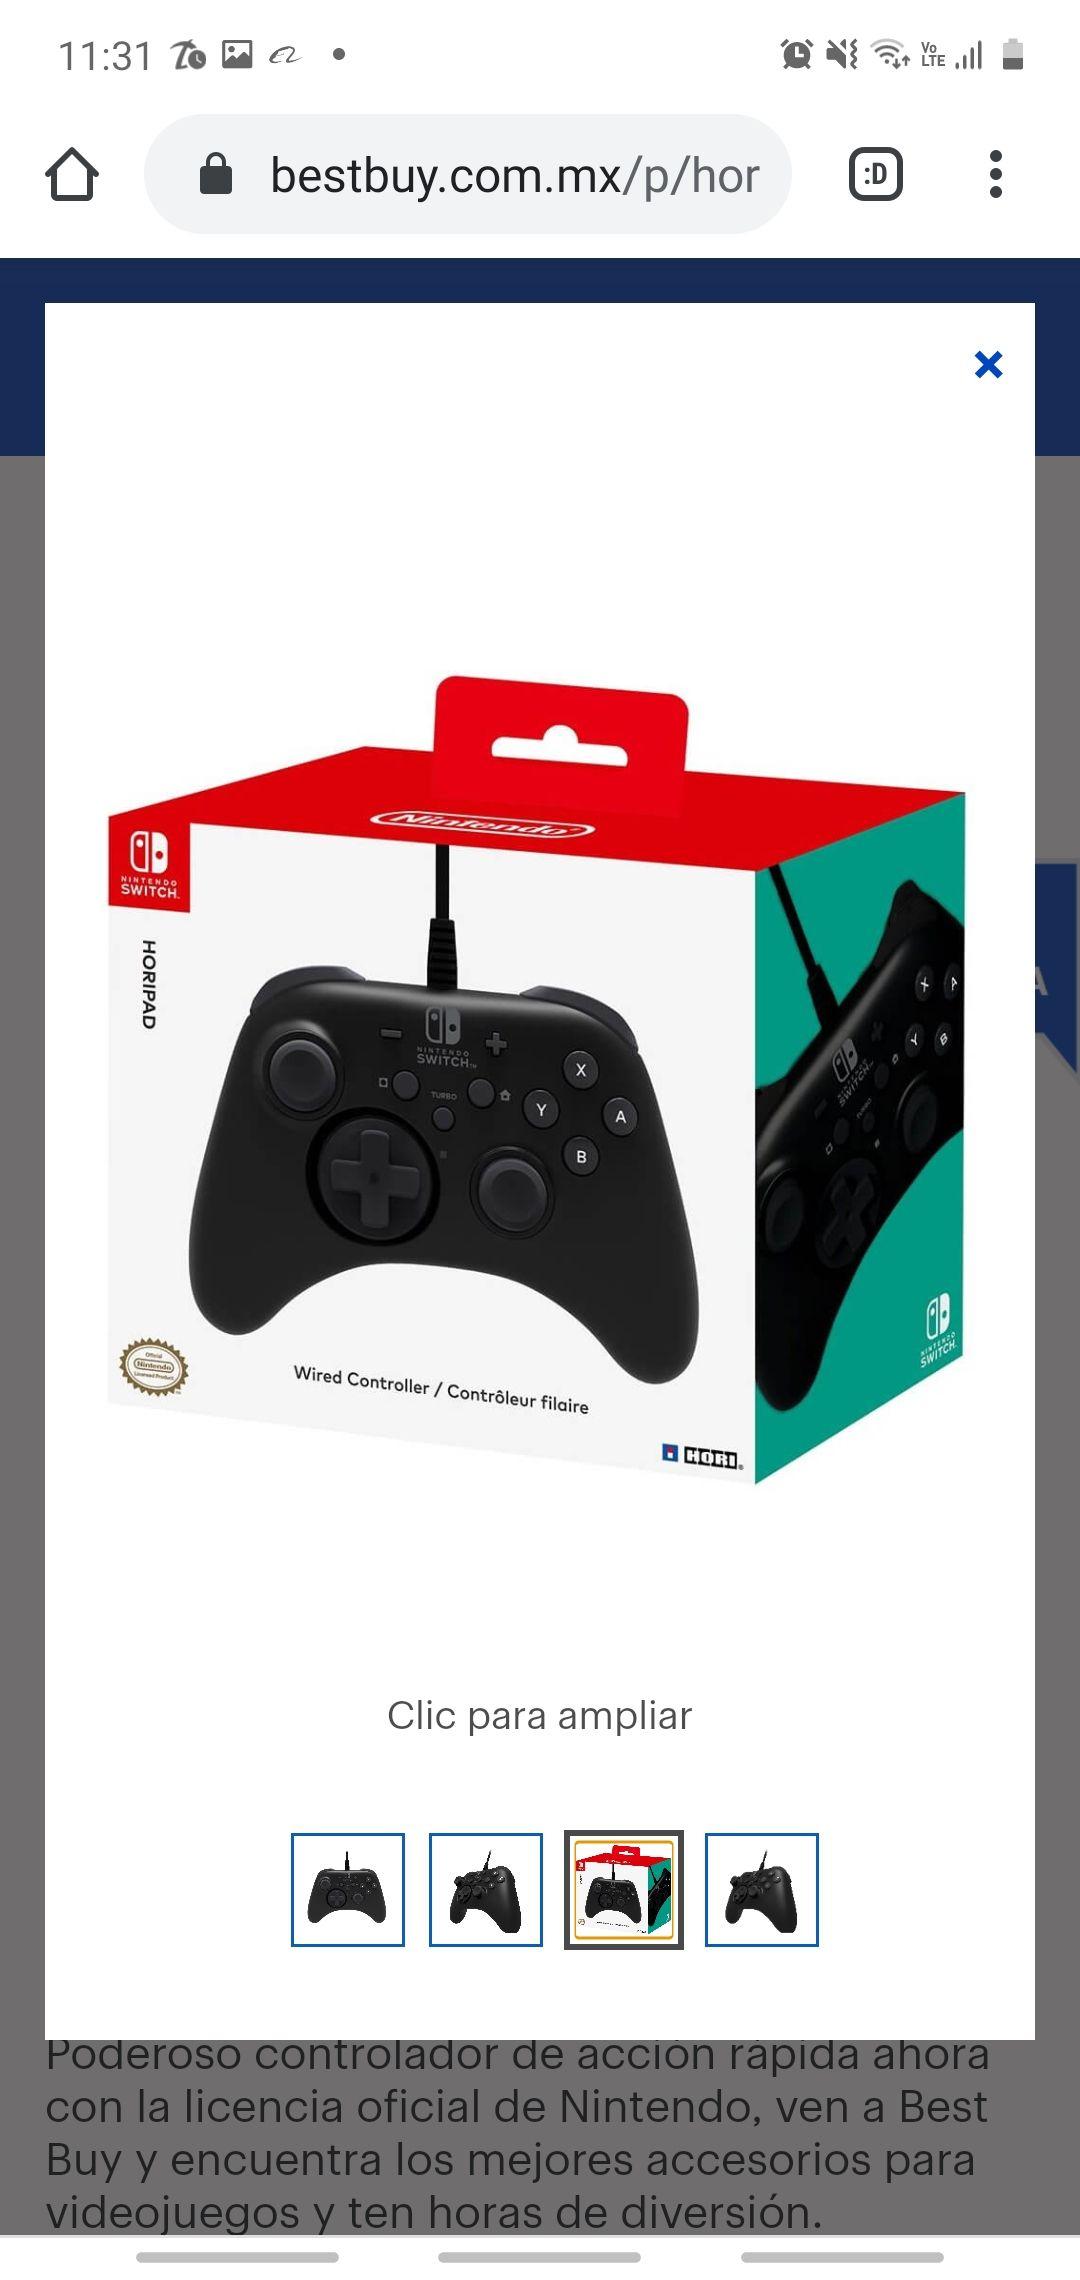 BEST BUY: Game pad para Nintendo Switch